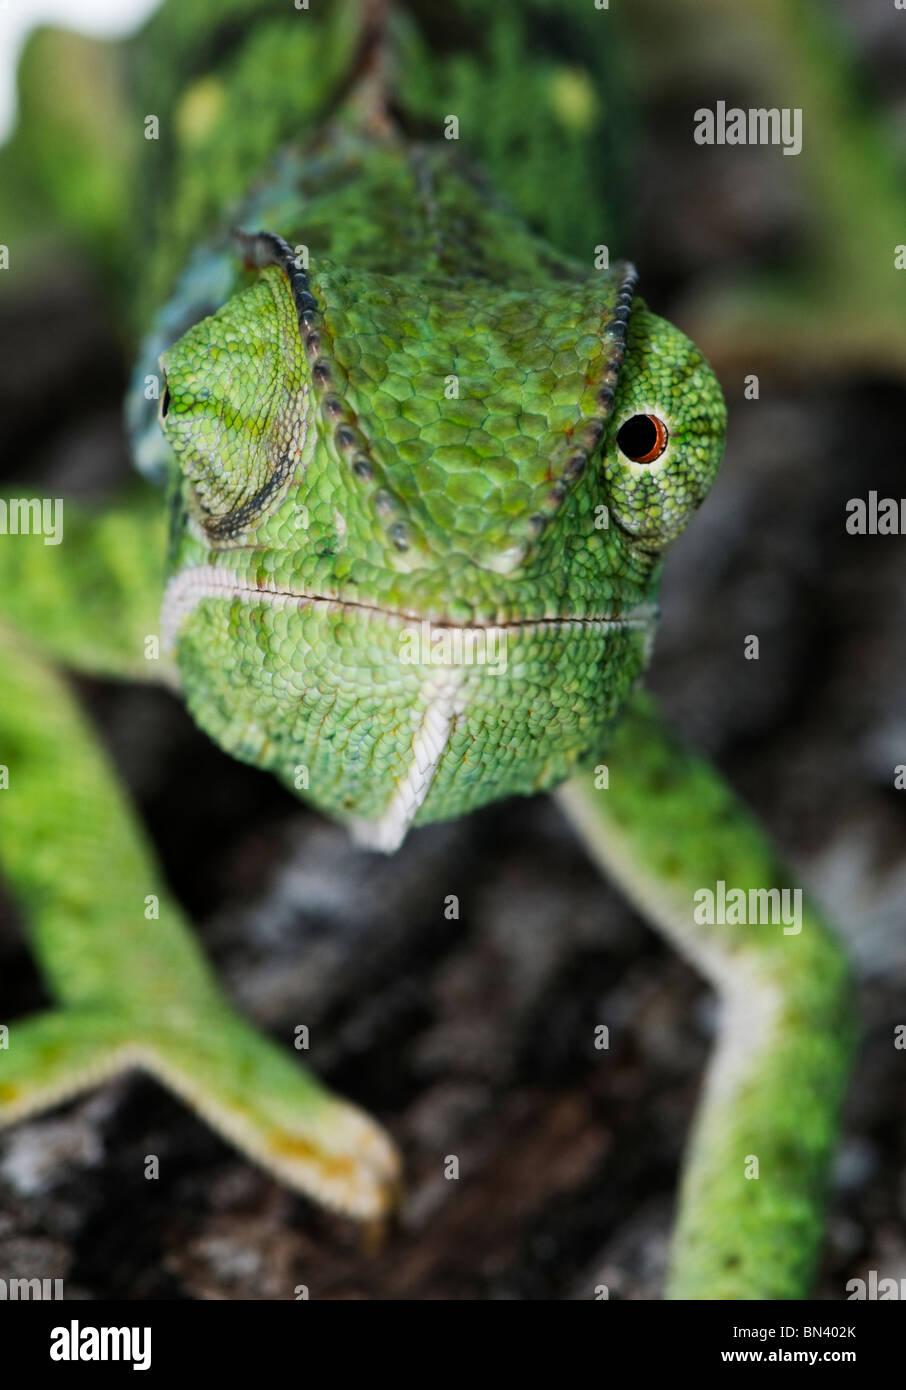 Close up of Flap-necked Chameleon, Chameleo delepis - Stock Image